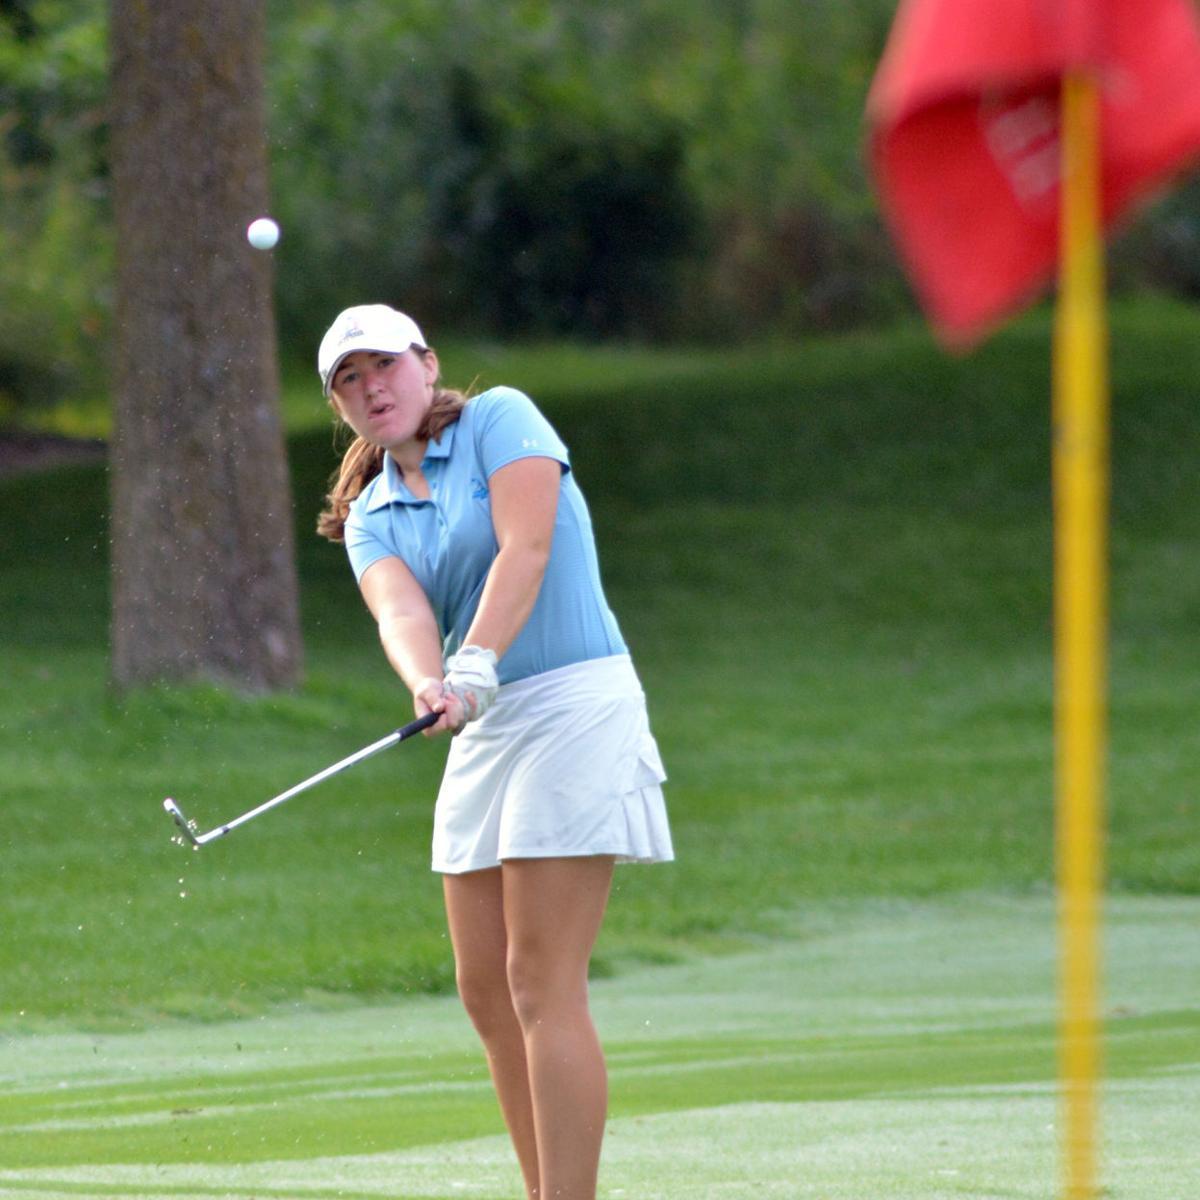 WPGA Junior Championship highlights 2018 junior golf calendar as Wisconsin PGA unveils key dates on summer schedule